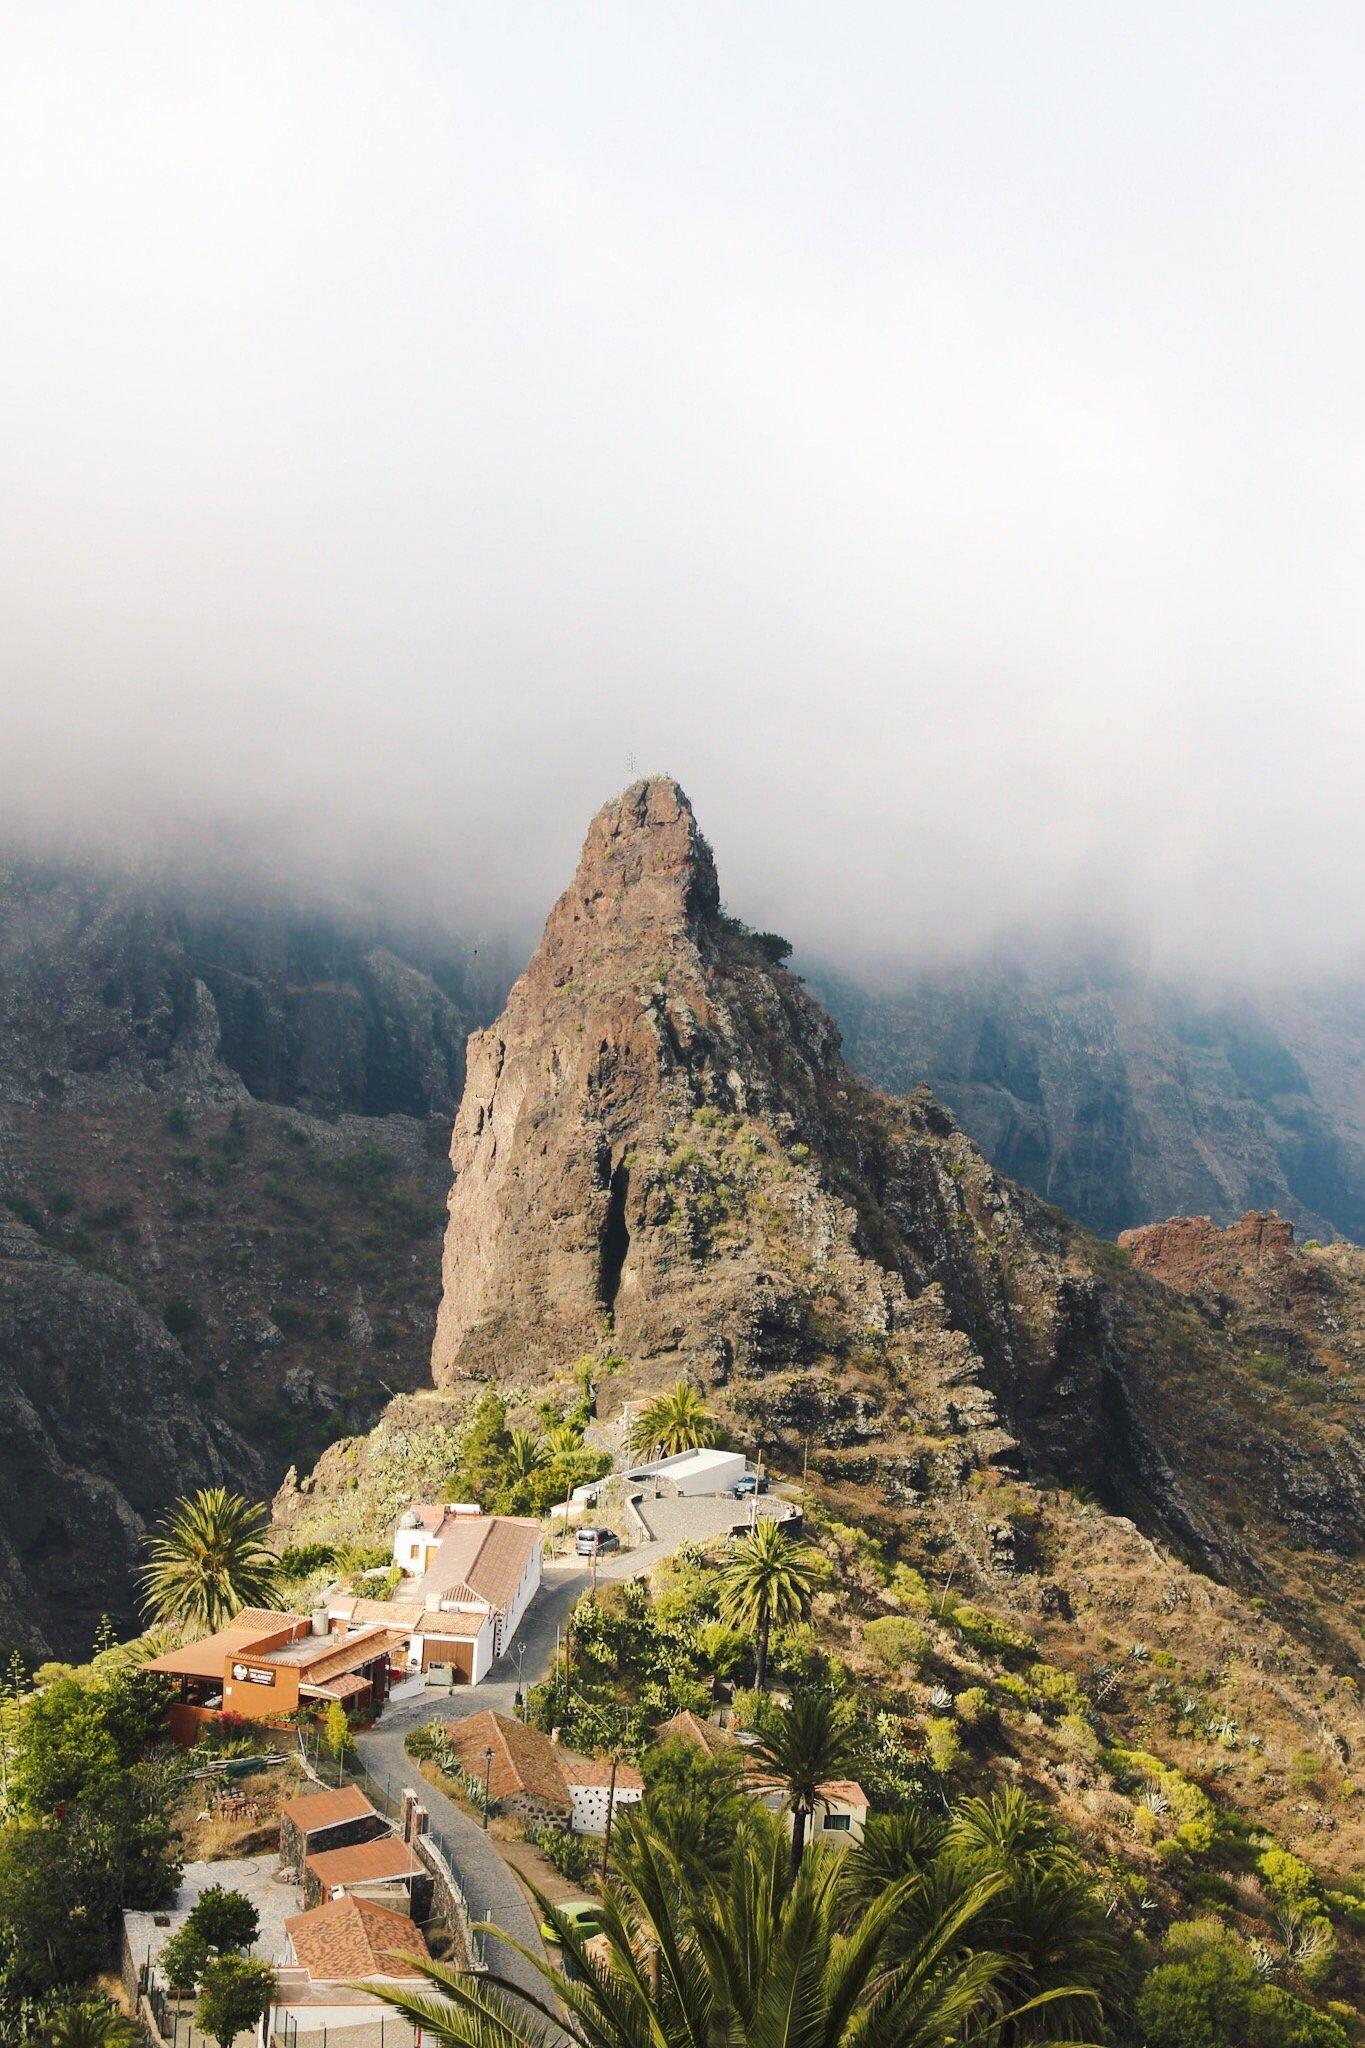 Masca, Tenerife, Canary Islands